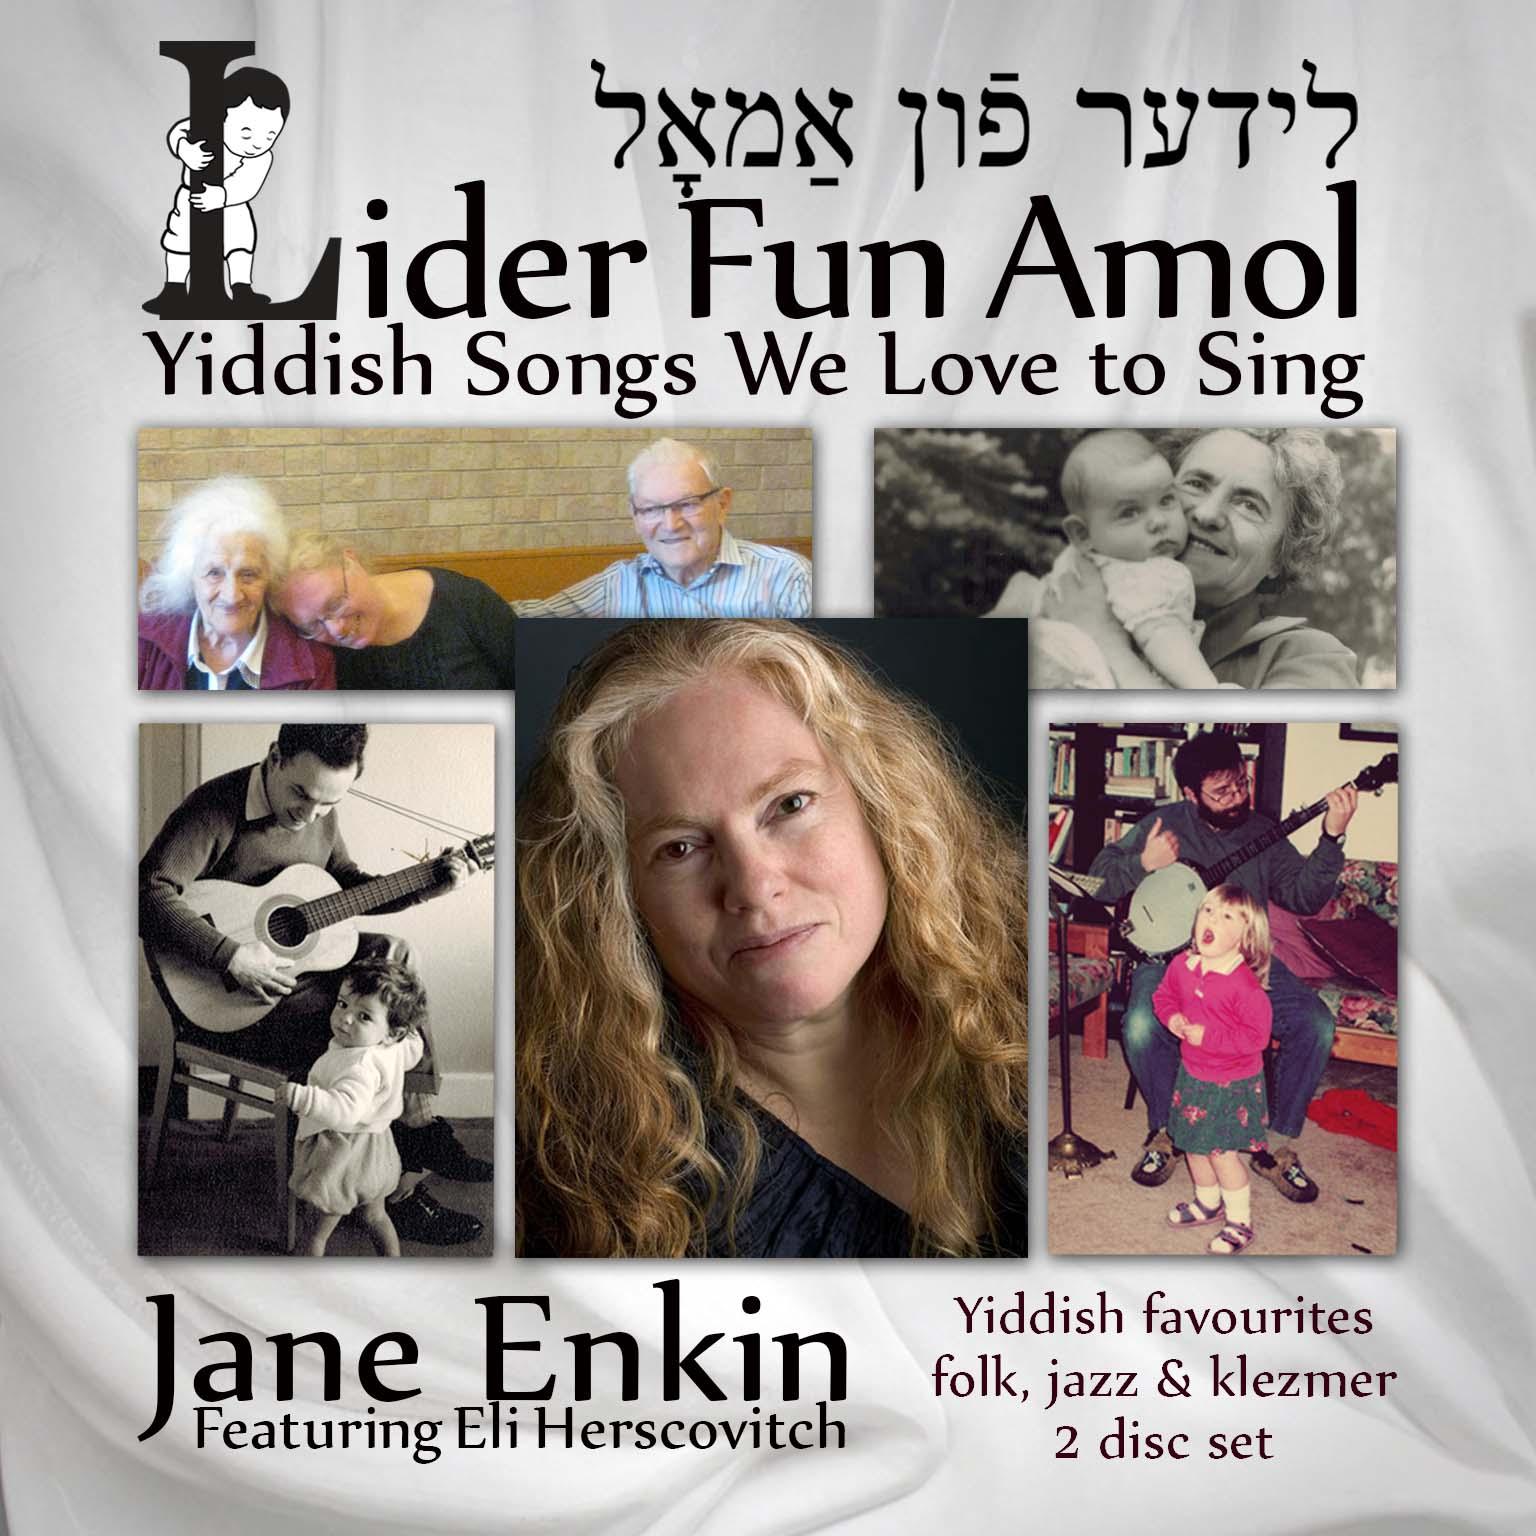 Lider Fun Amol -- Yiddish Songs We Love To Sing